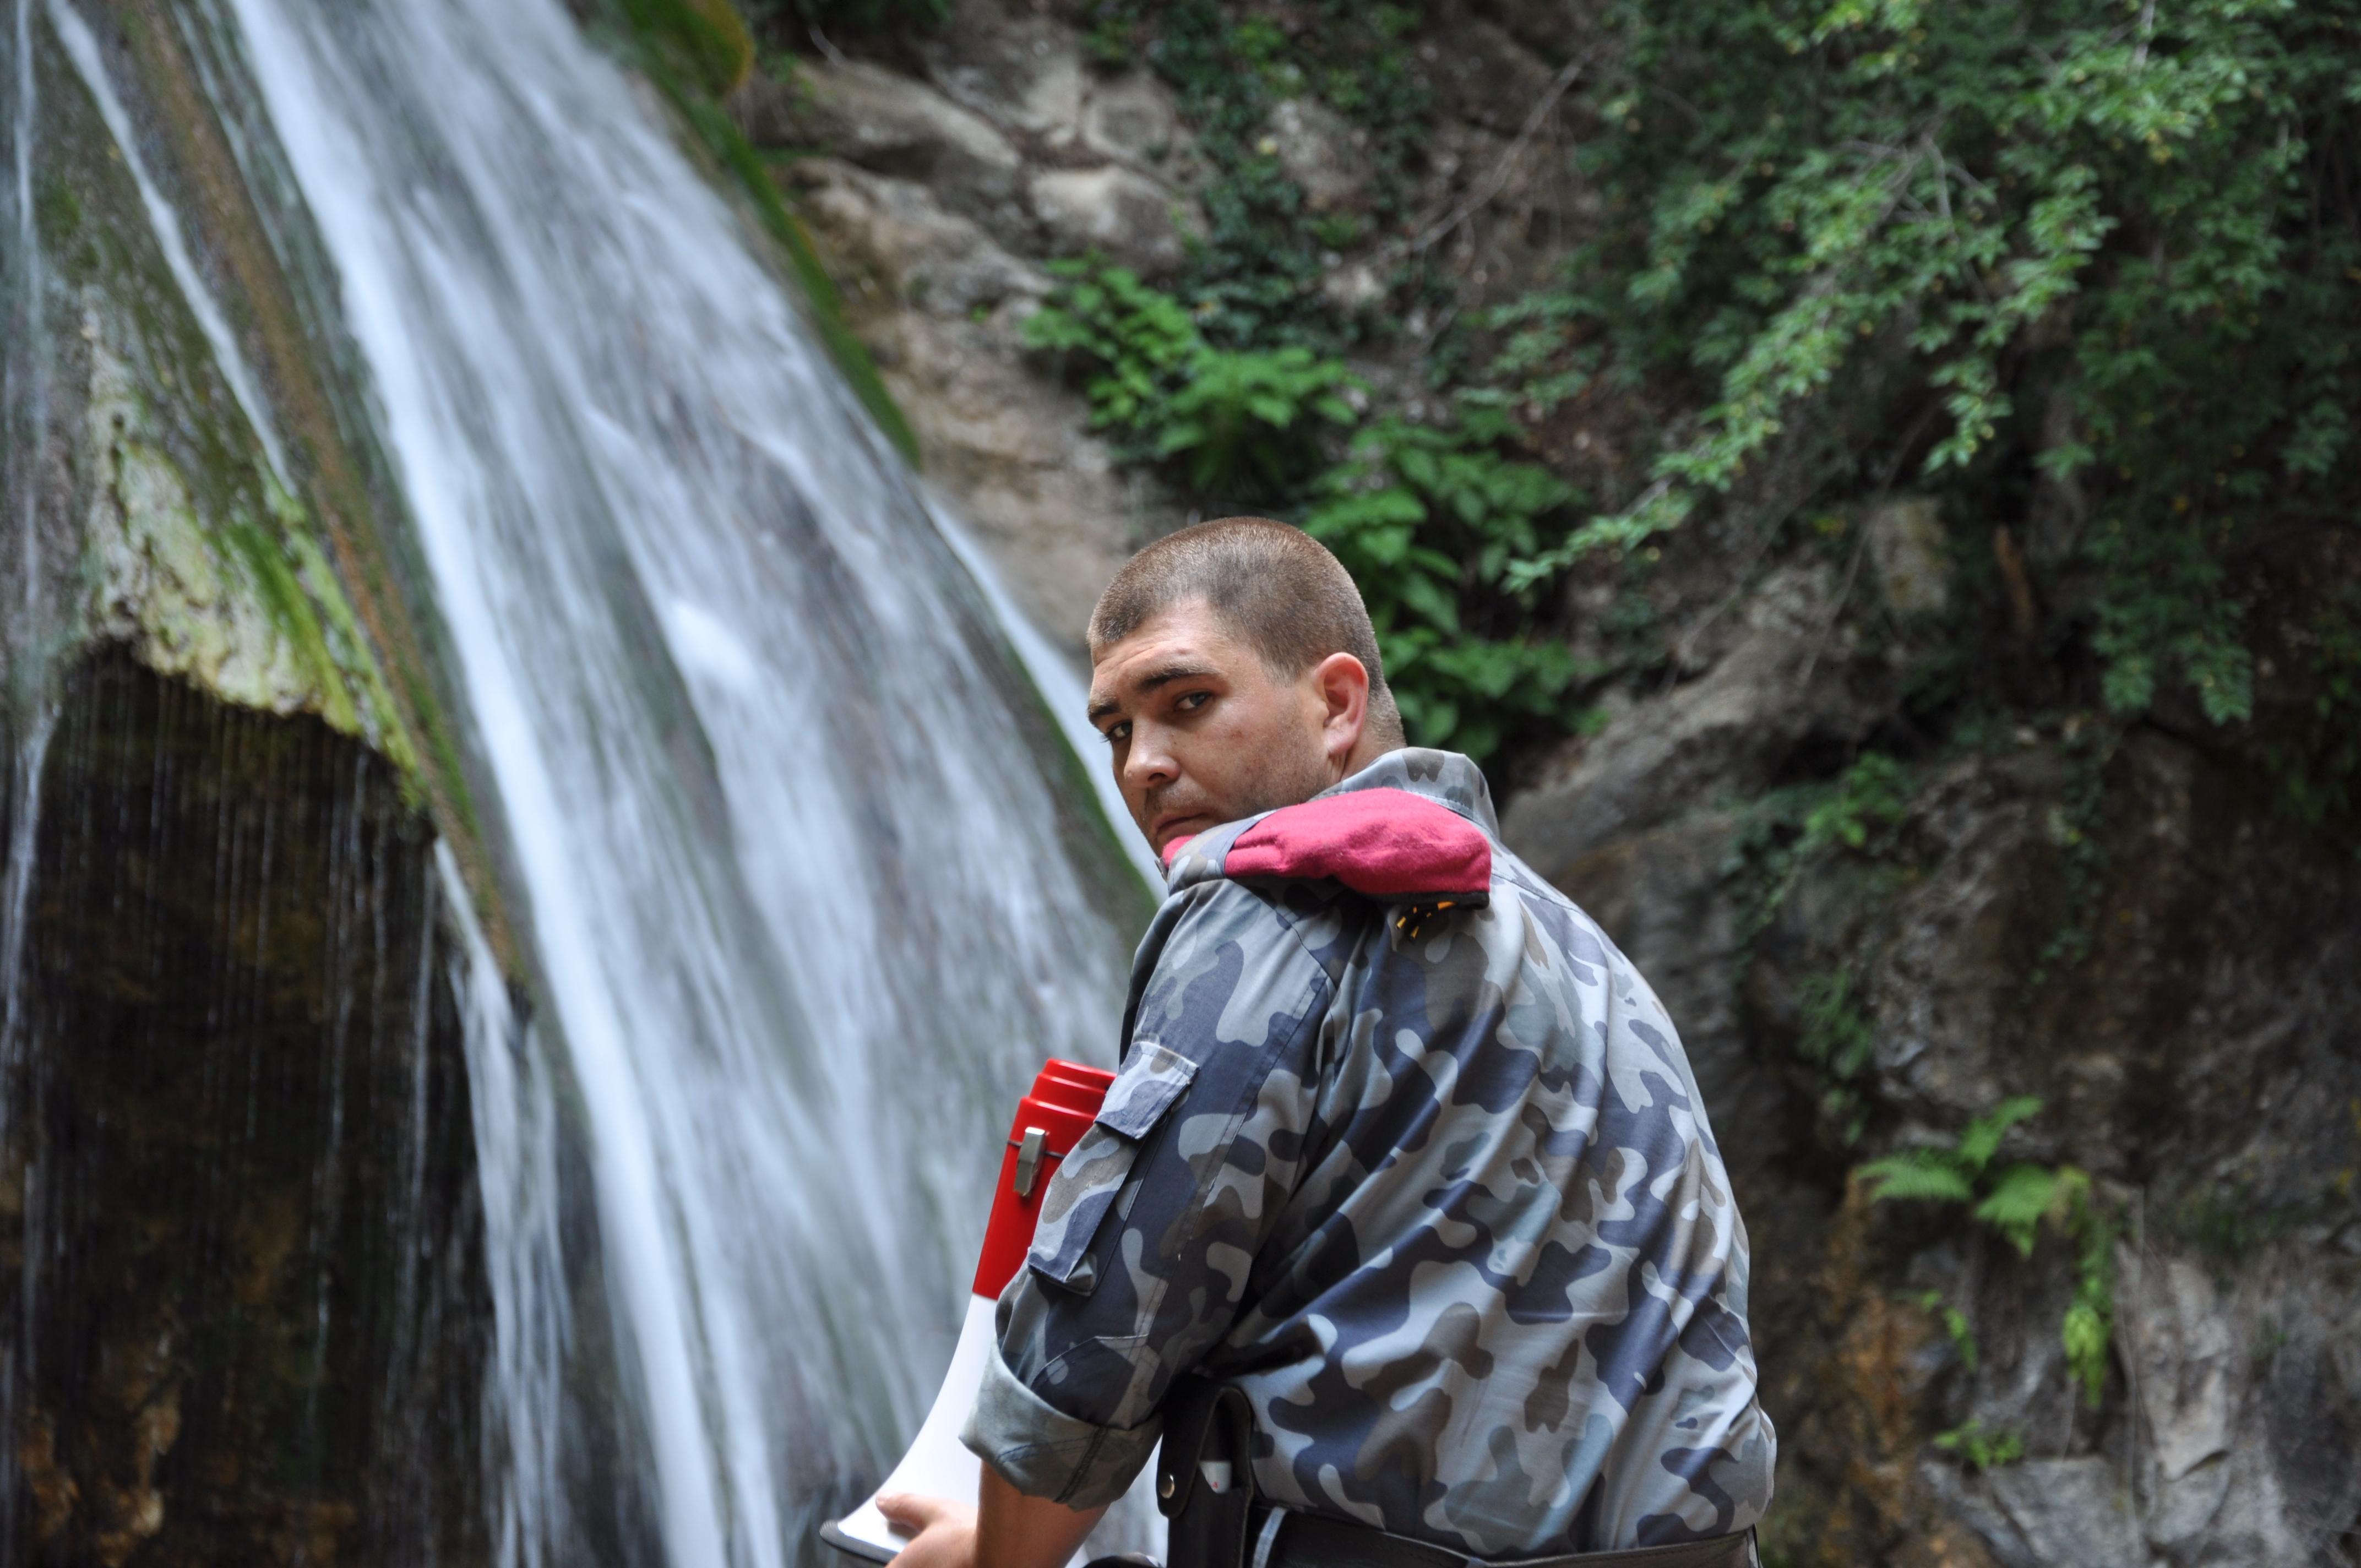 Охранник на водопаде Джур-джур